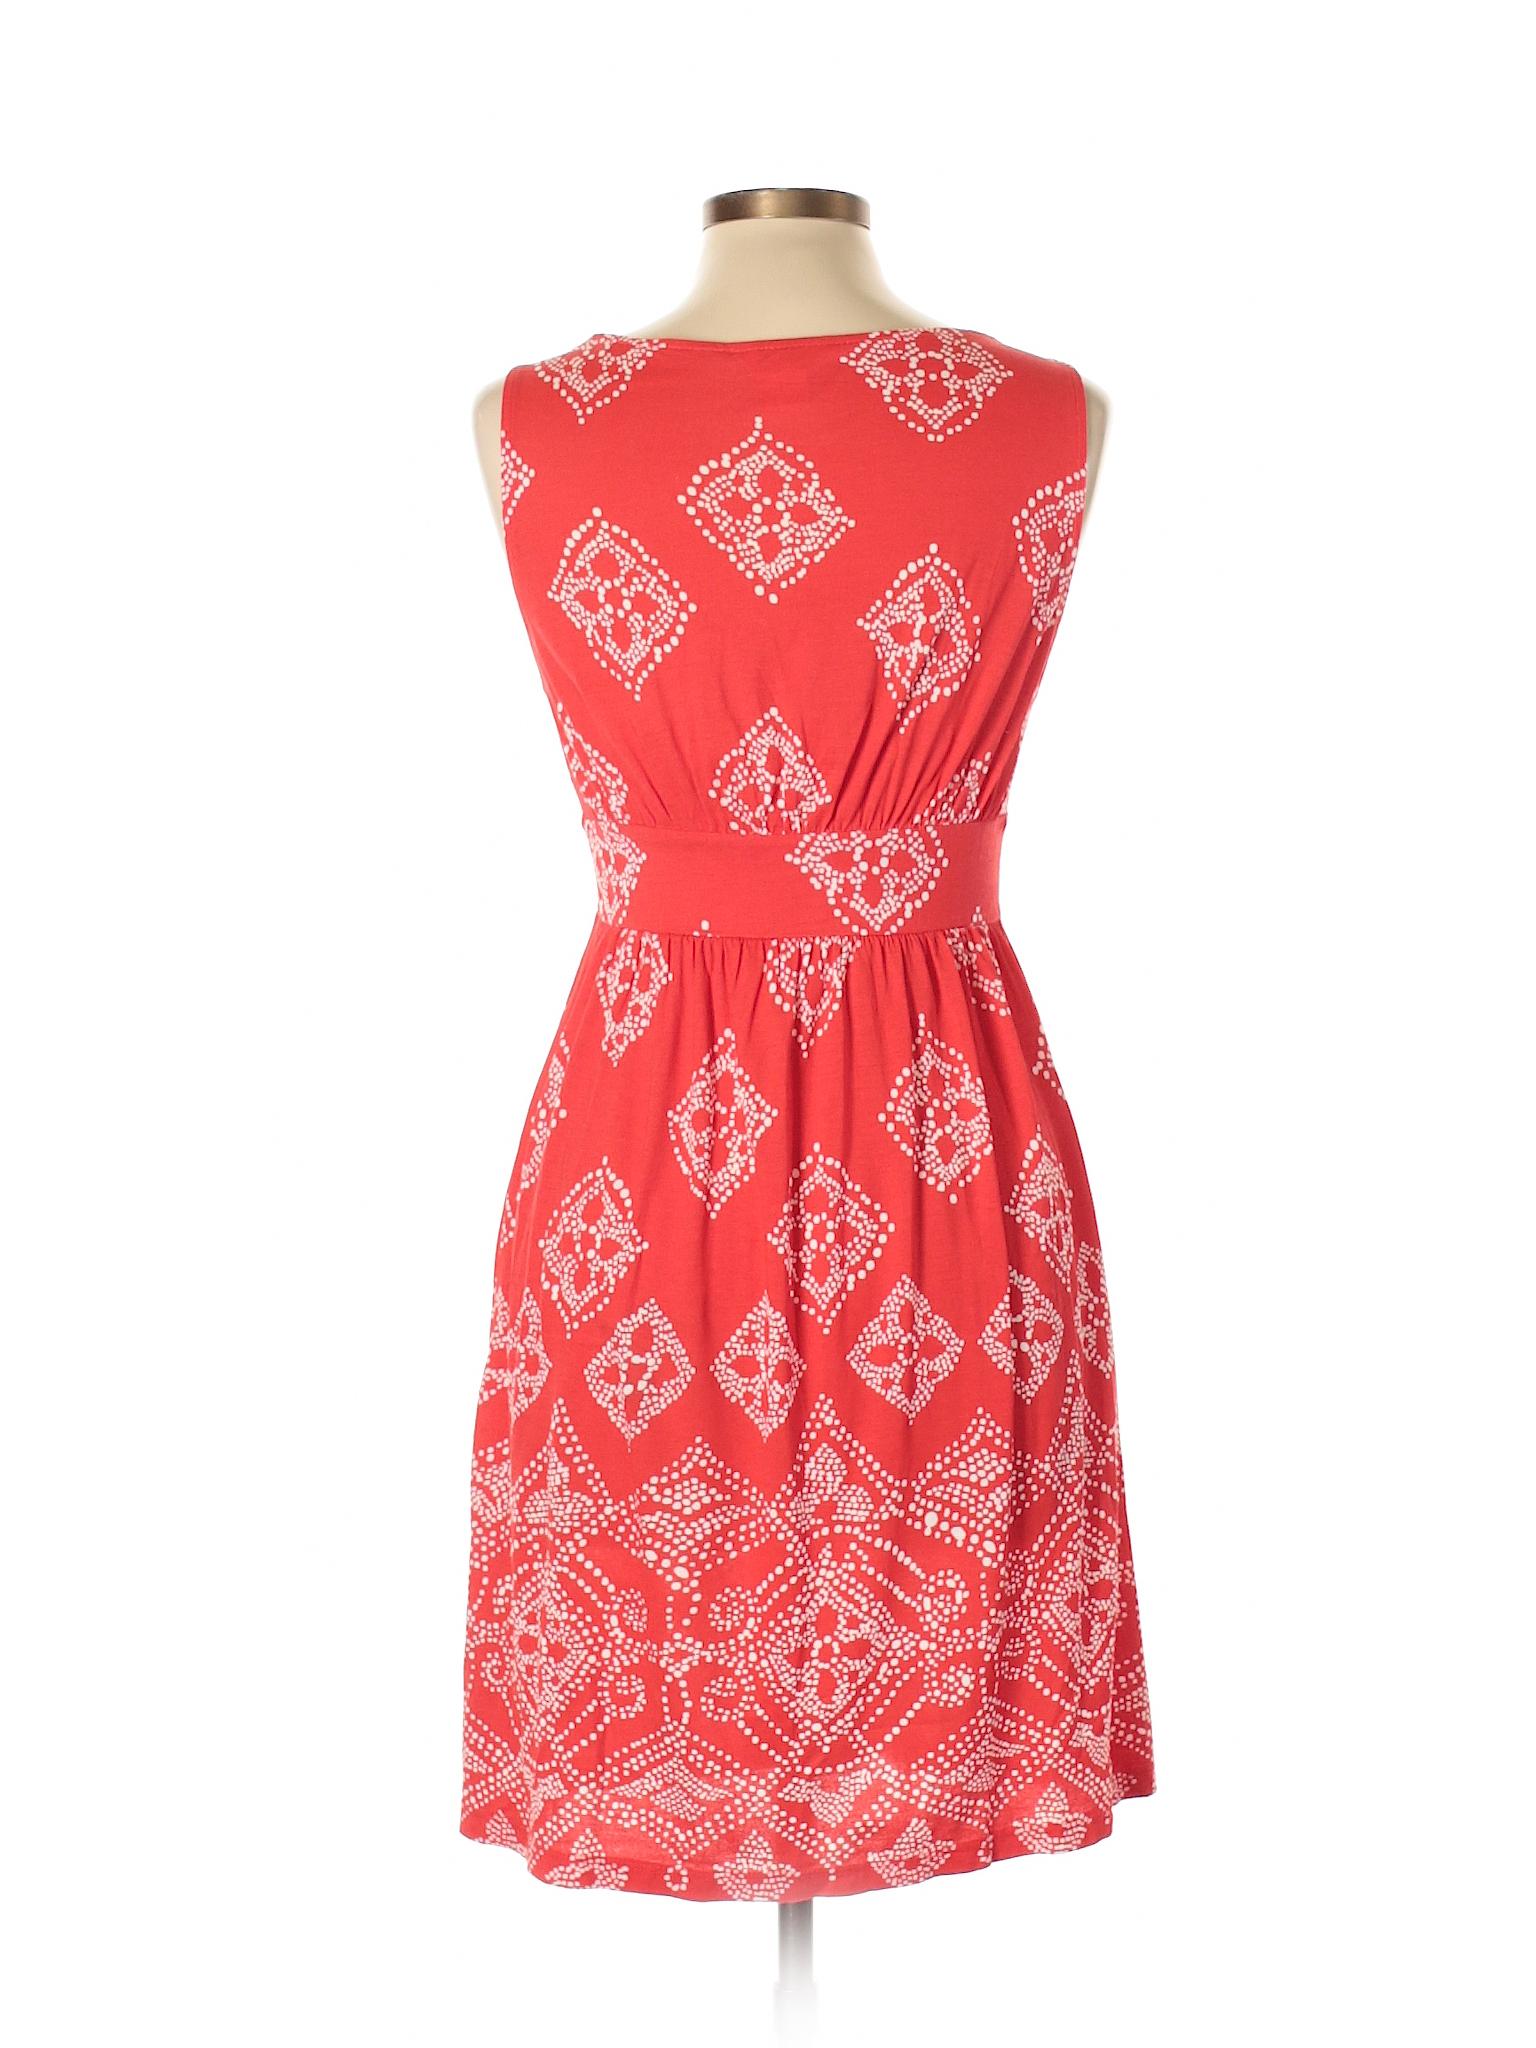 Casual Joe Boutique Dress winter Fresh qZqgzt5